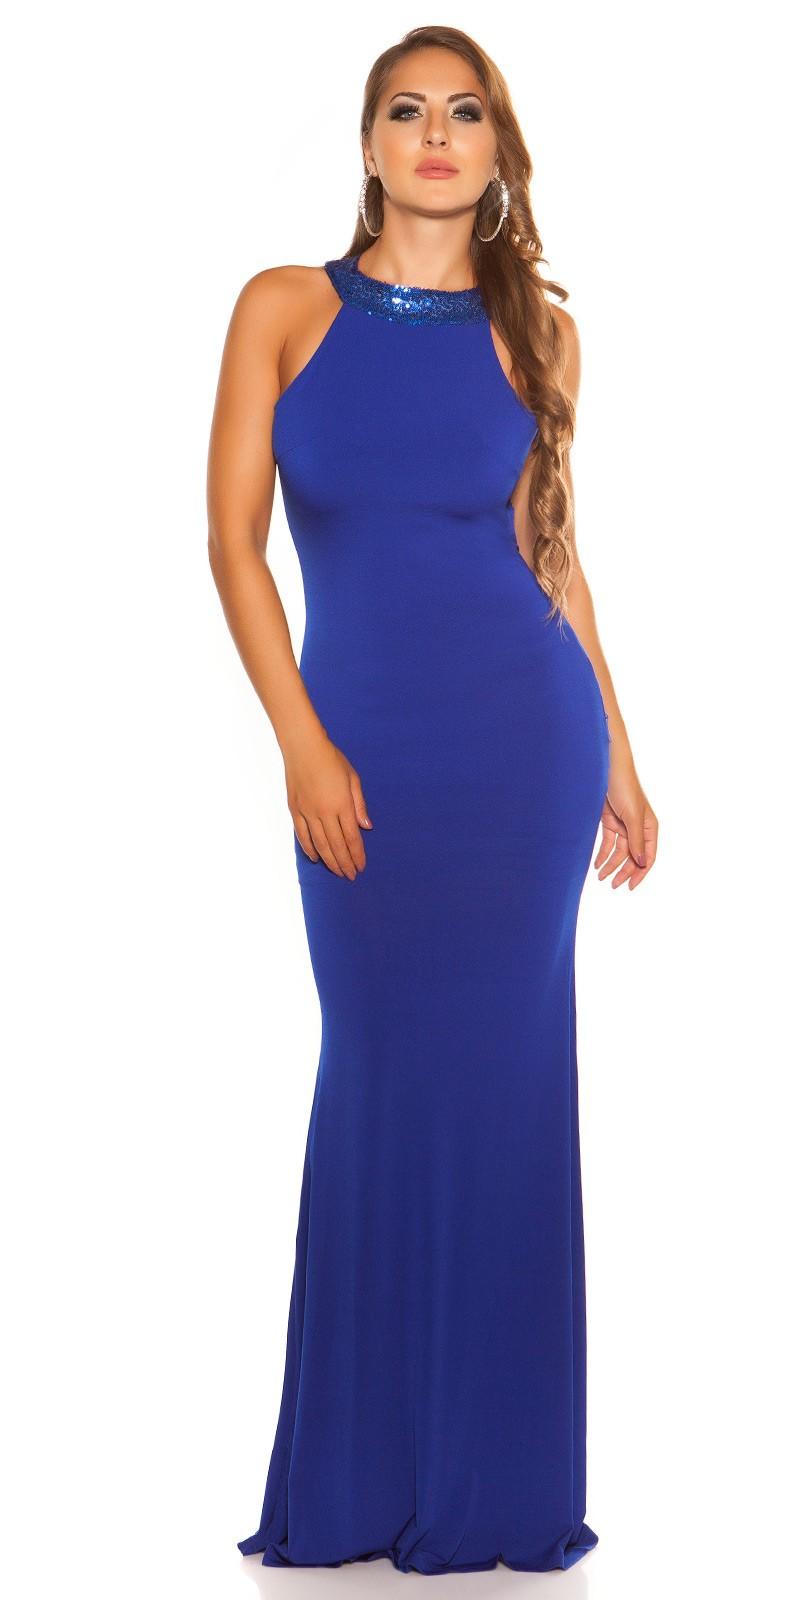 6b68fd2e1fad Plesové šaty - IF 19099 - modré